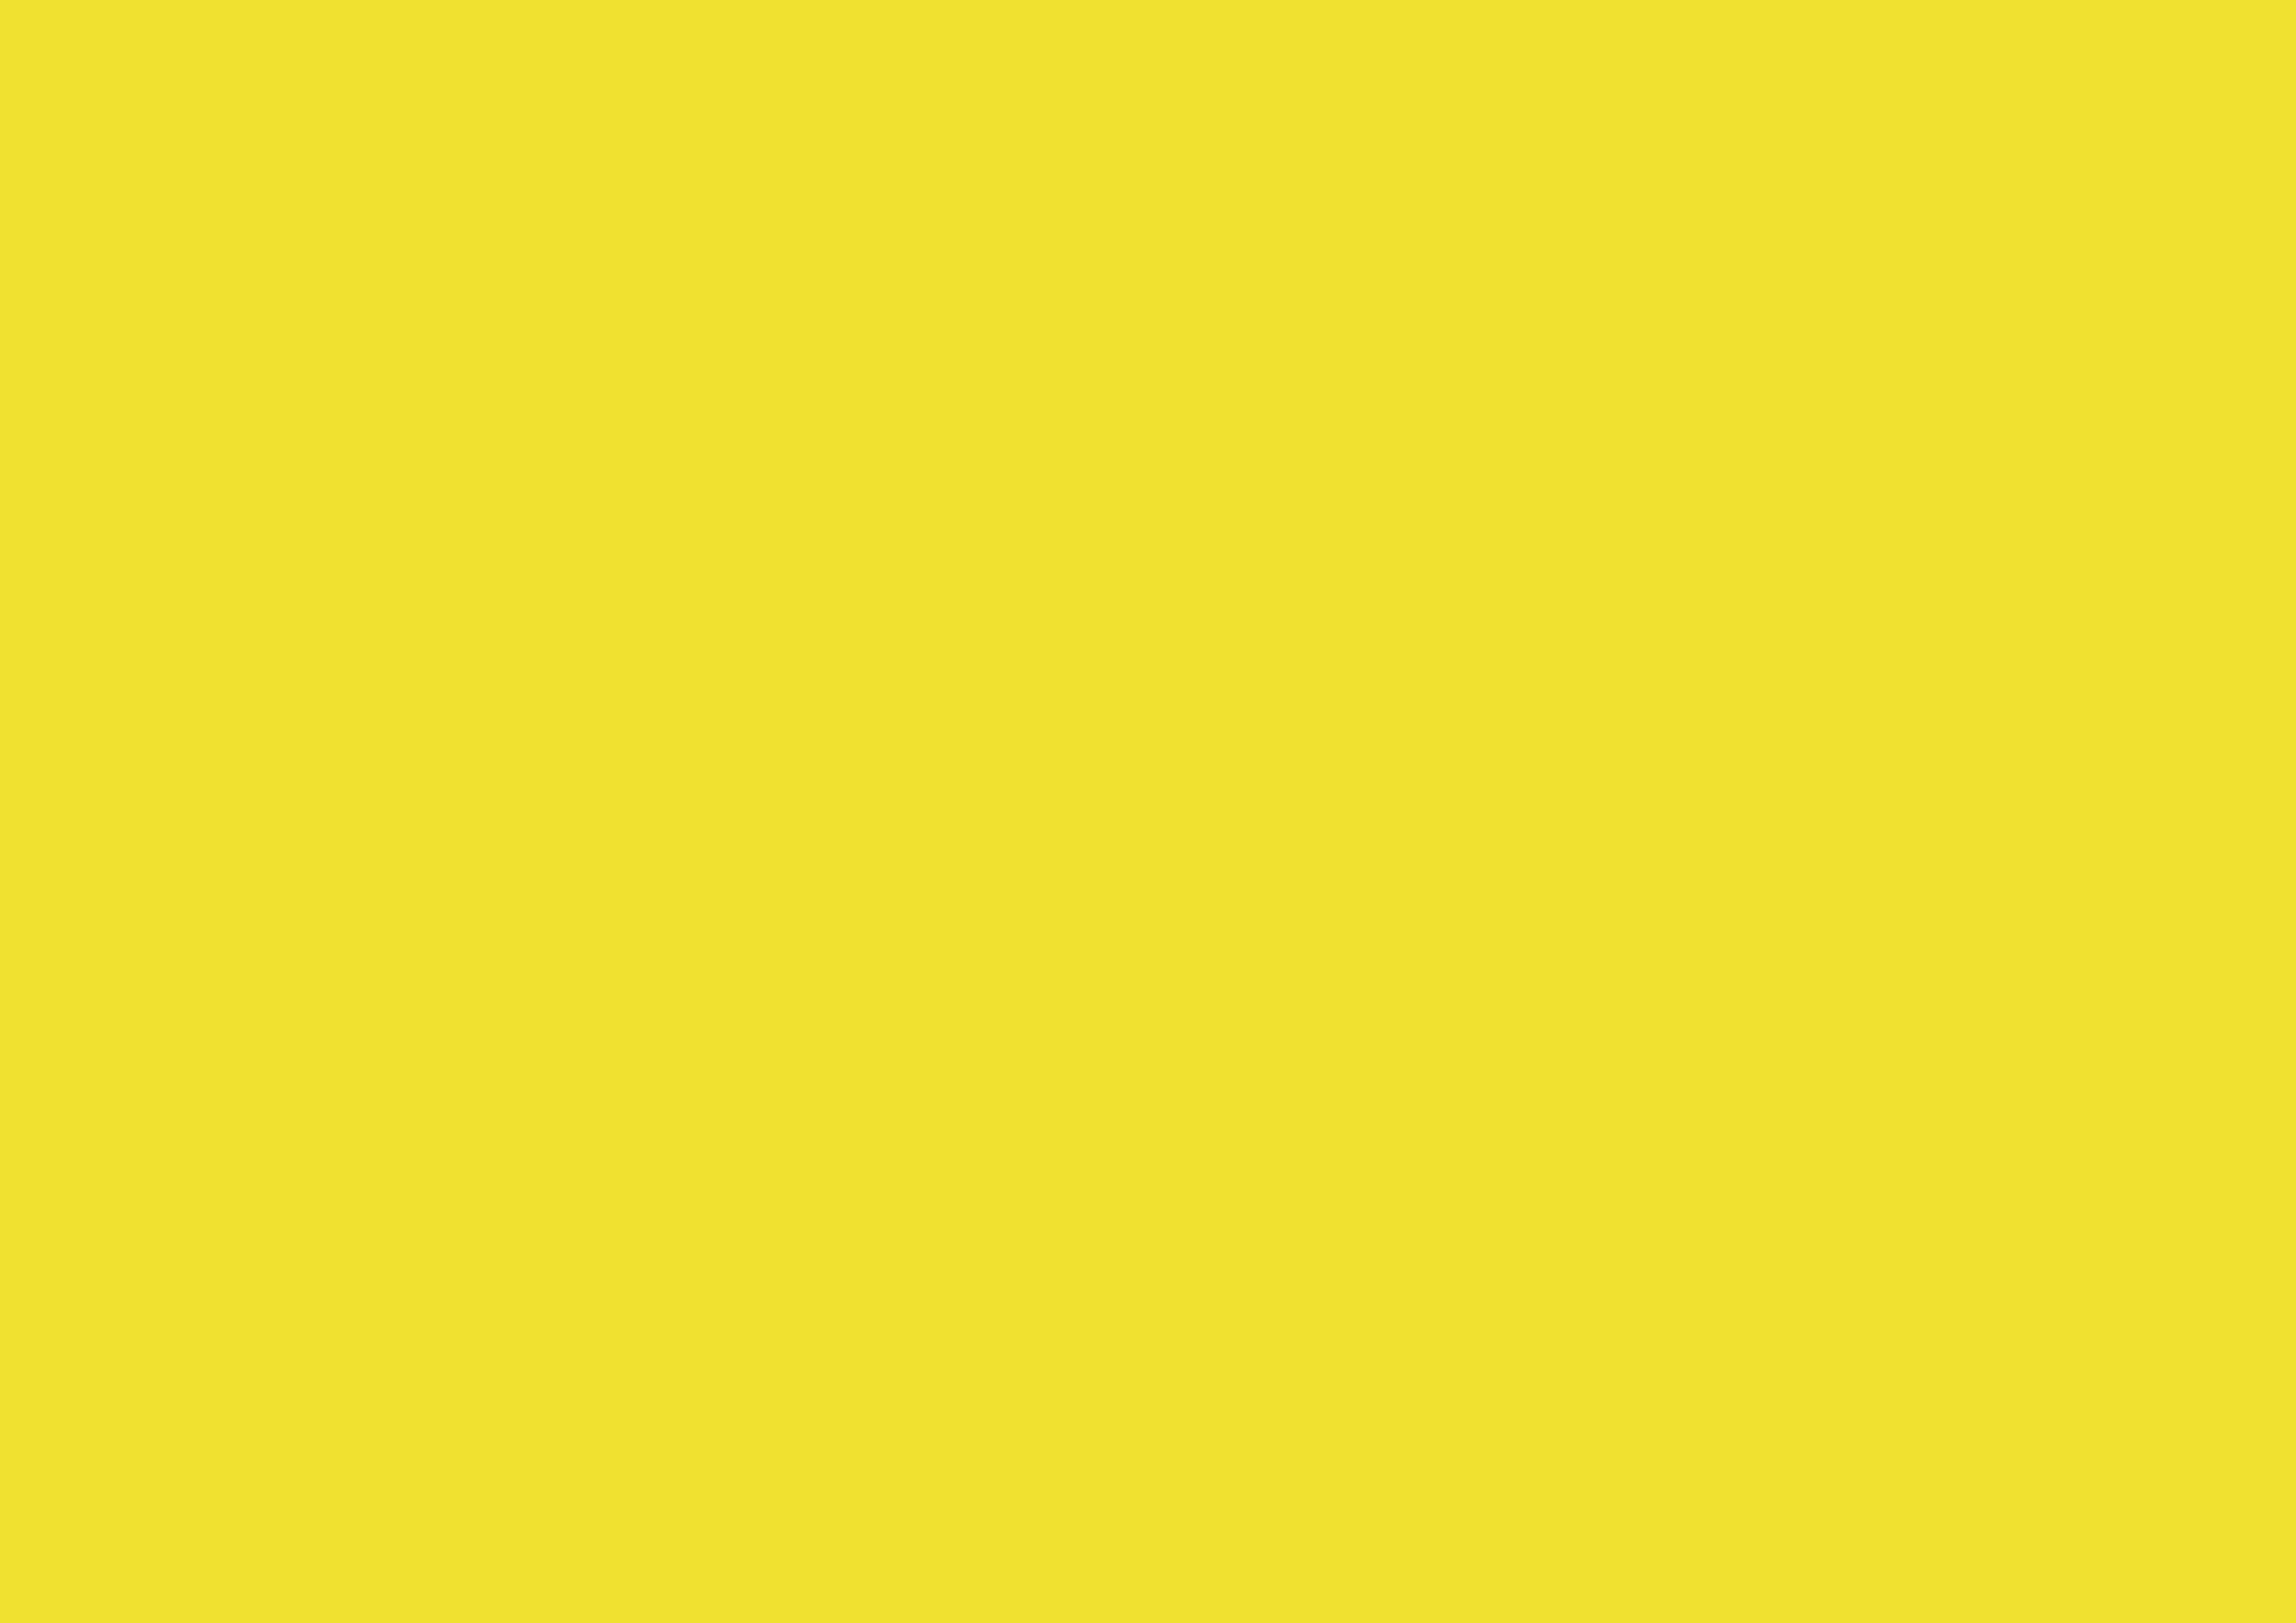 3508x2480 Dandelion Solid Color Background